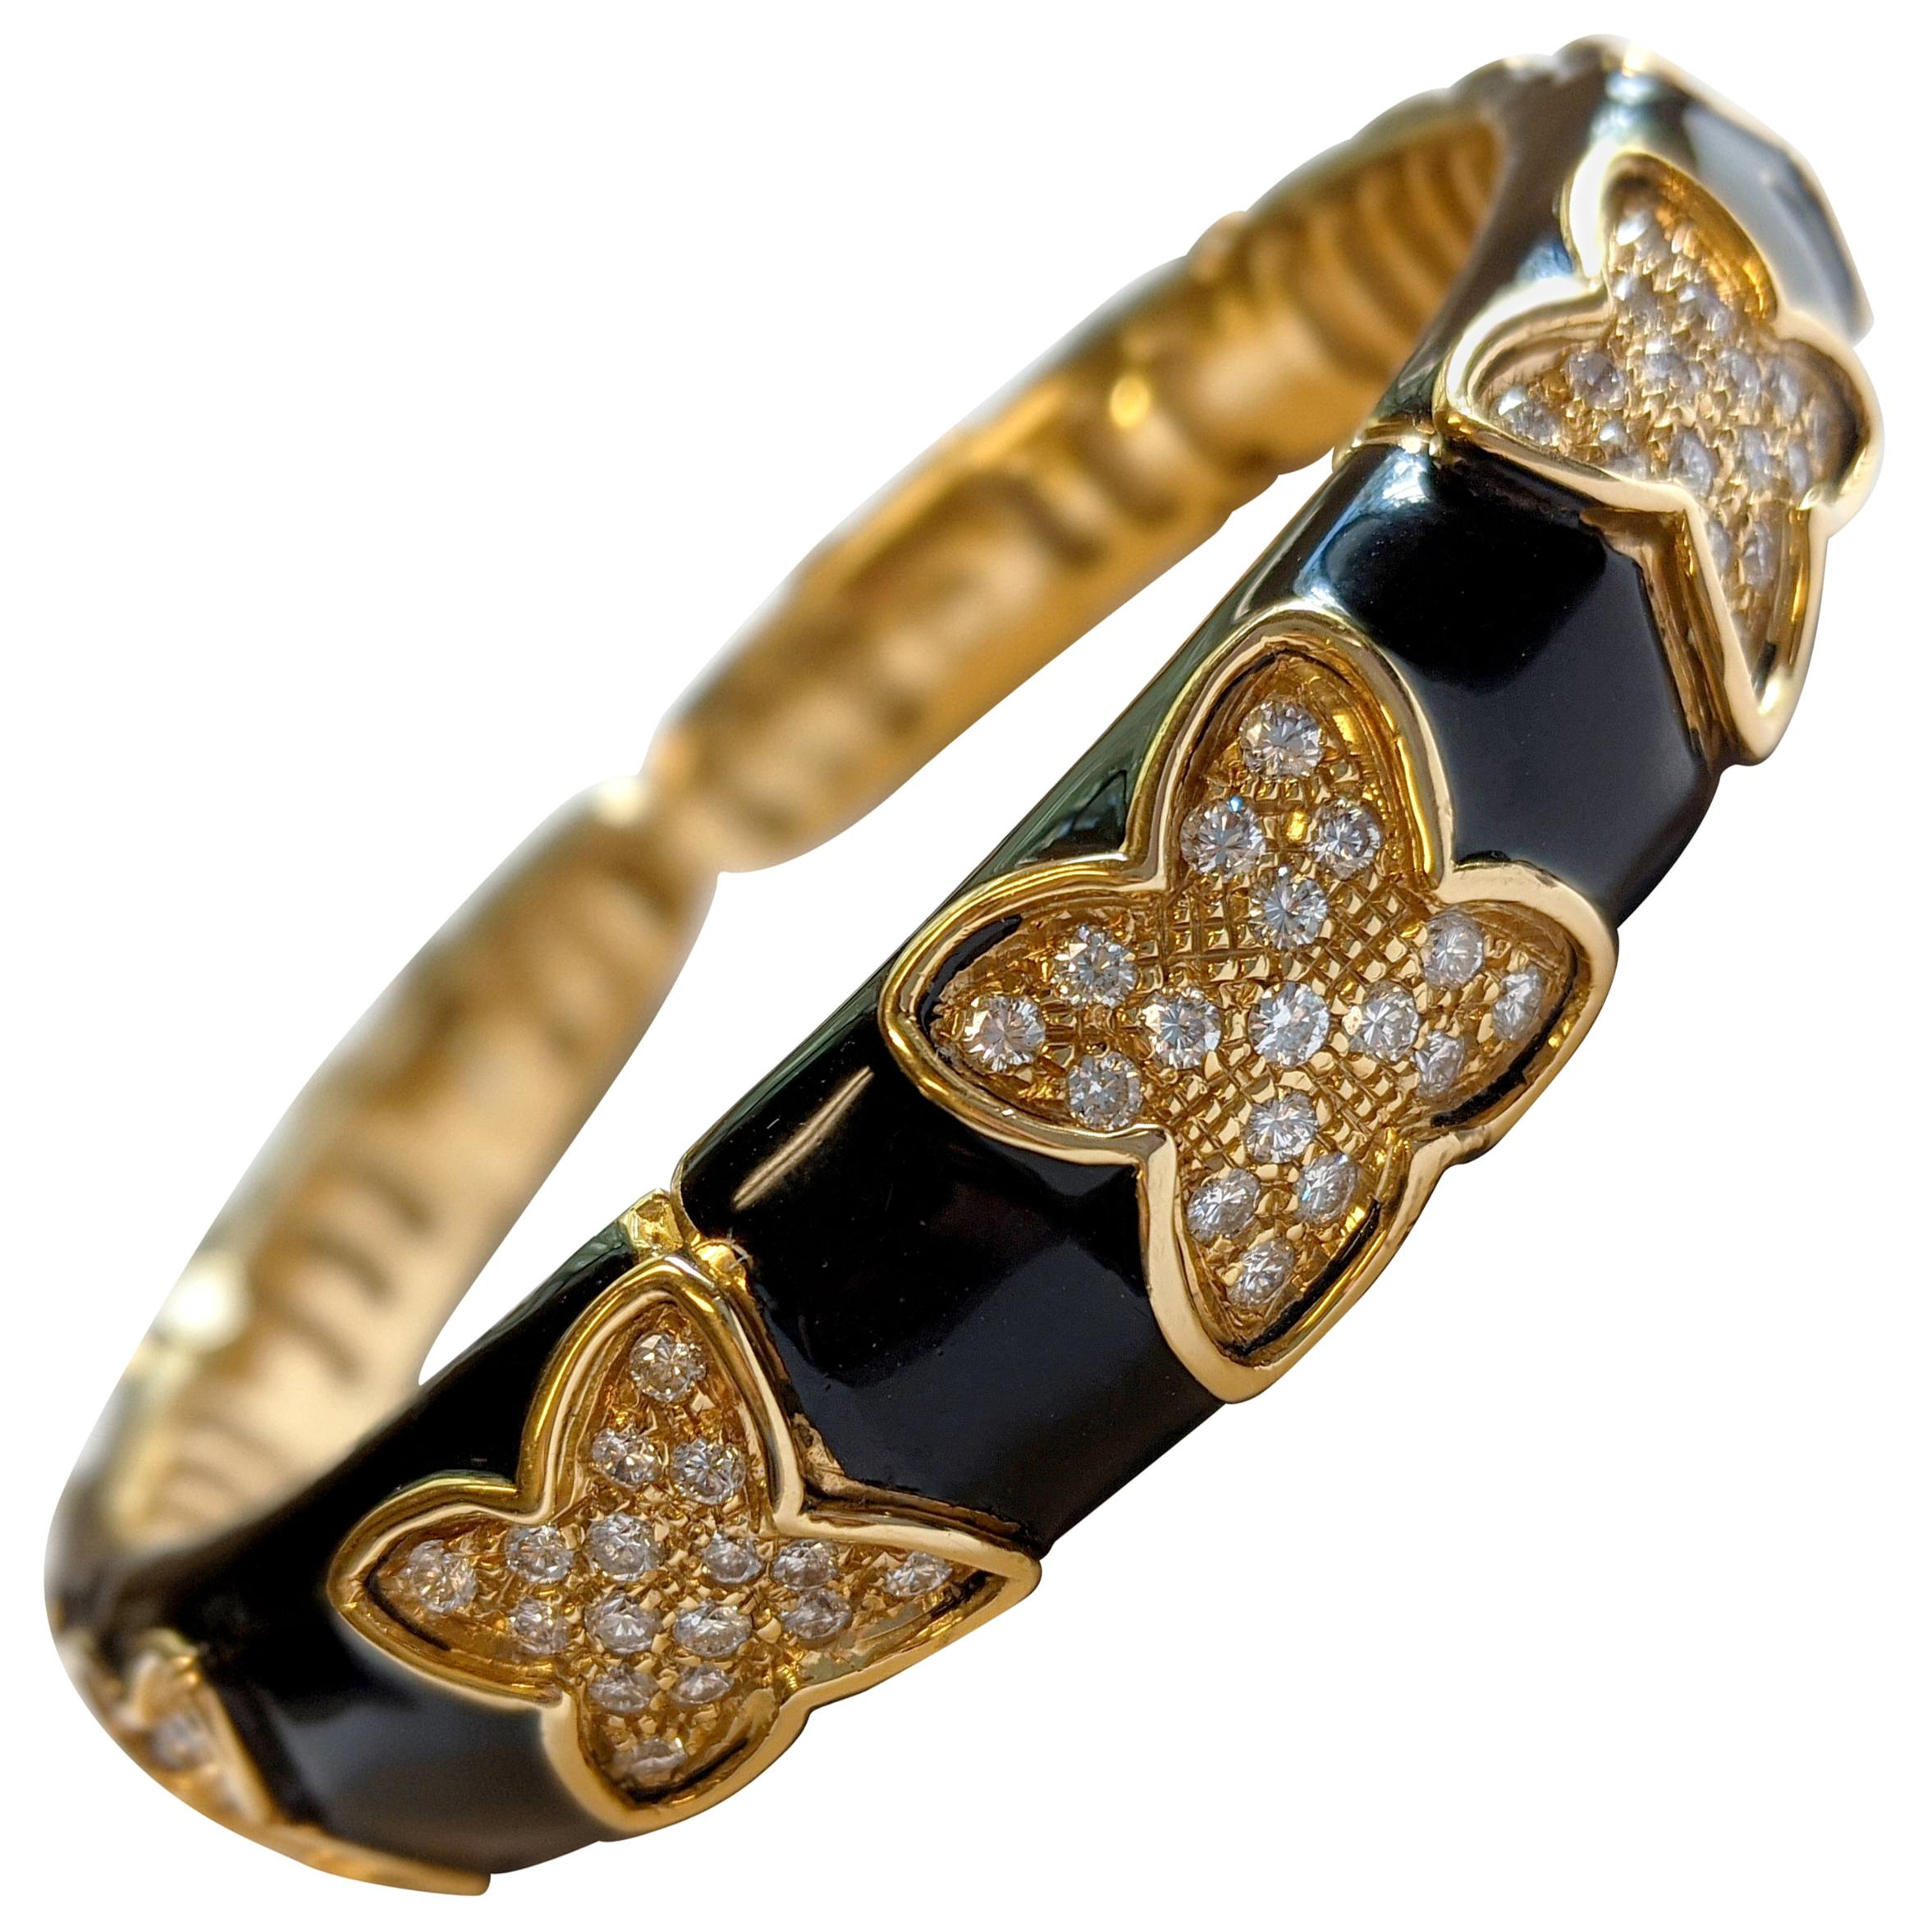 Vintage Black Enamel and Diamond Cuff Bracelet